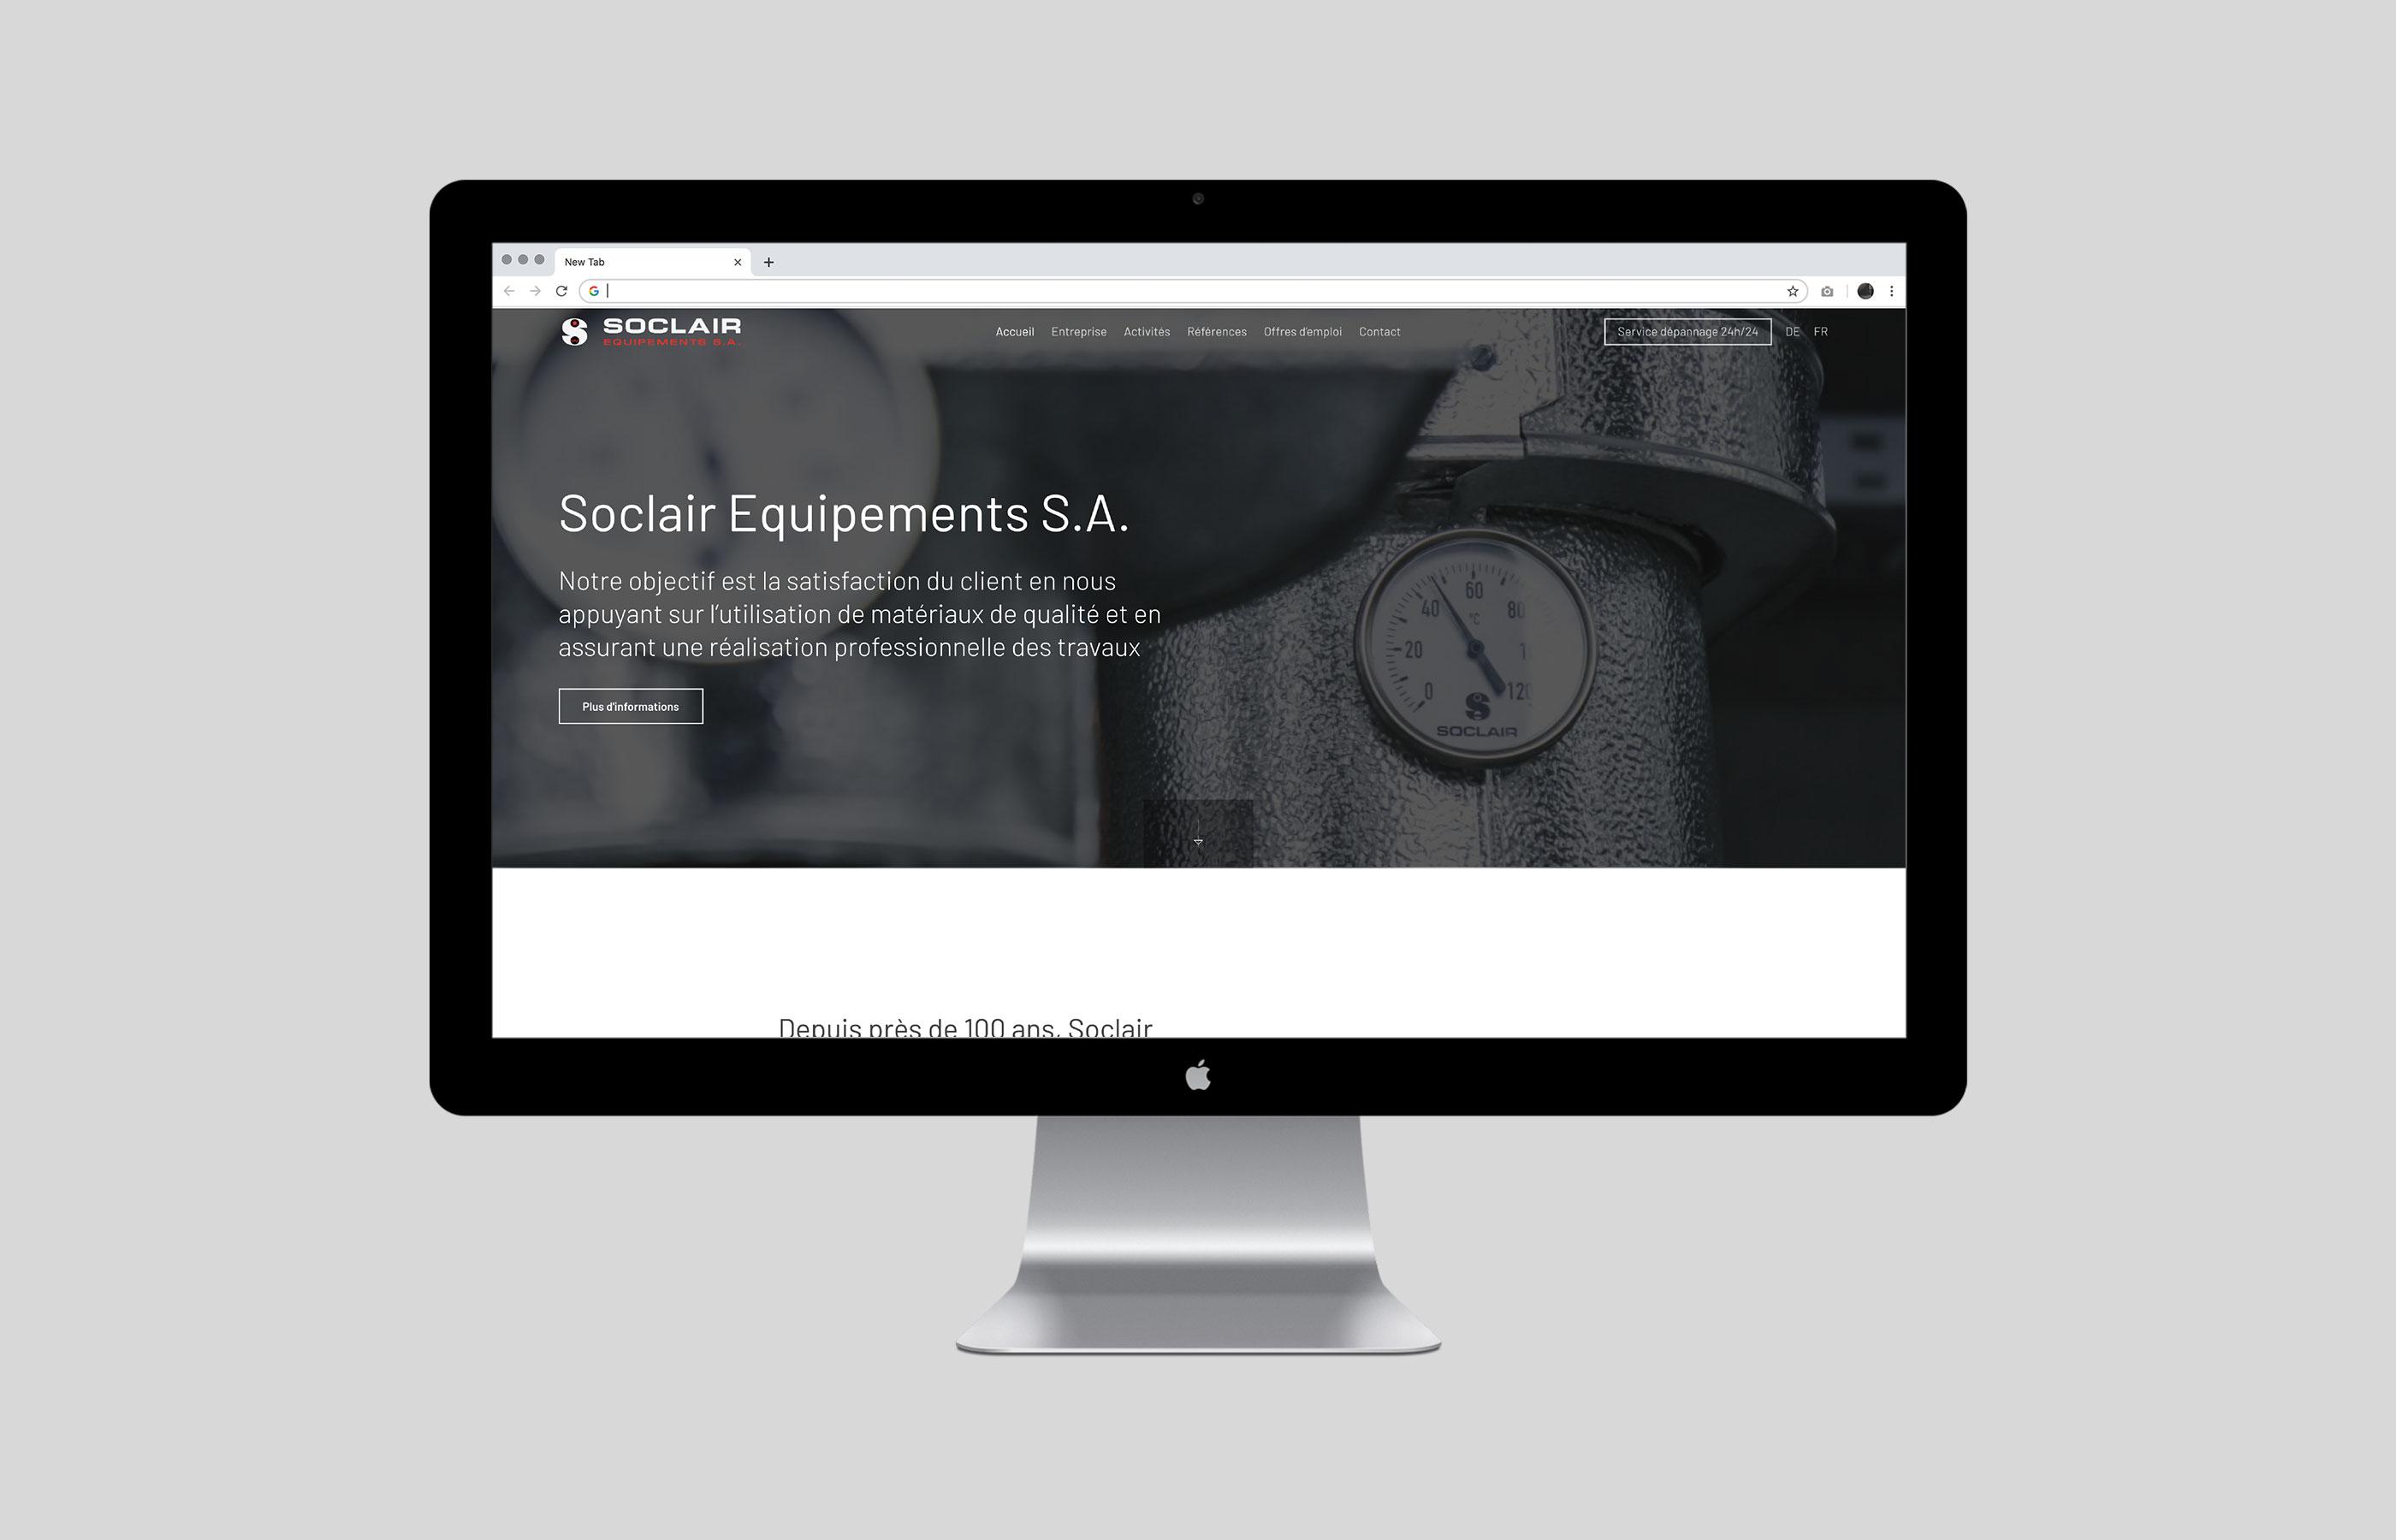 078-0217002-Moskito-Web-Soclair-OneScreen-2800x1800px